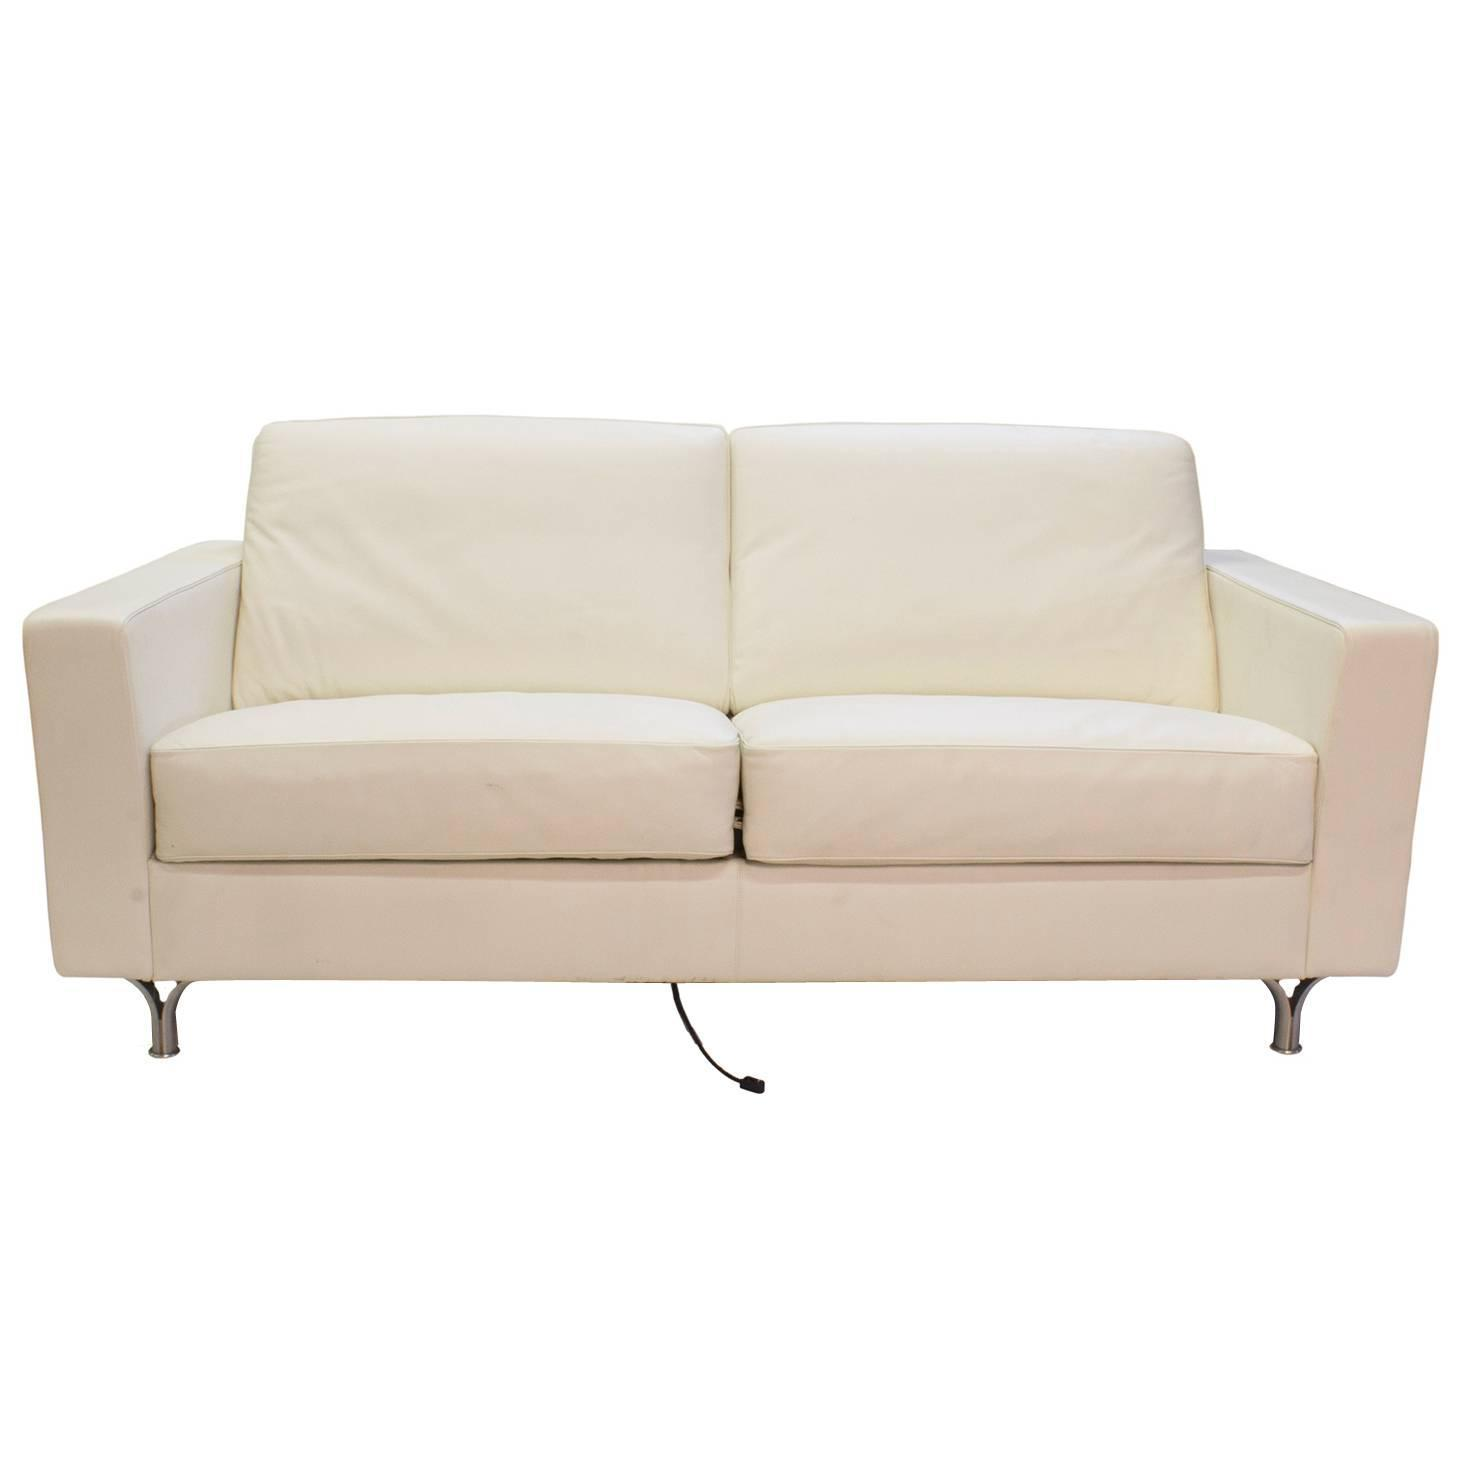 Leather sofa by poltrona frau at 1stdibs - Leather Sofa By Poltrona Frau At 1stdibs 58